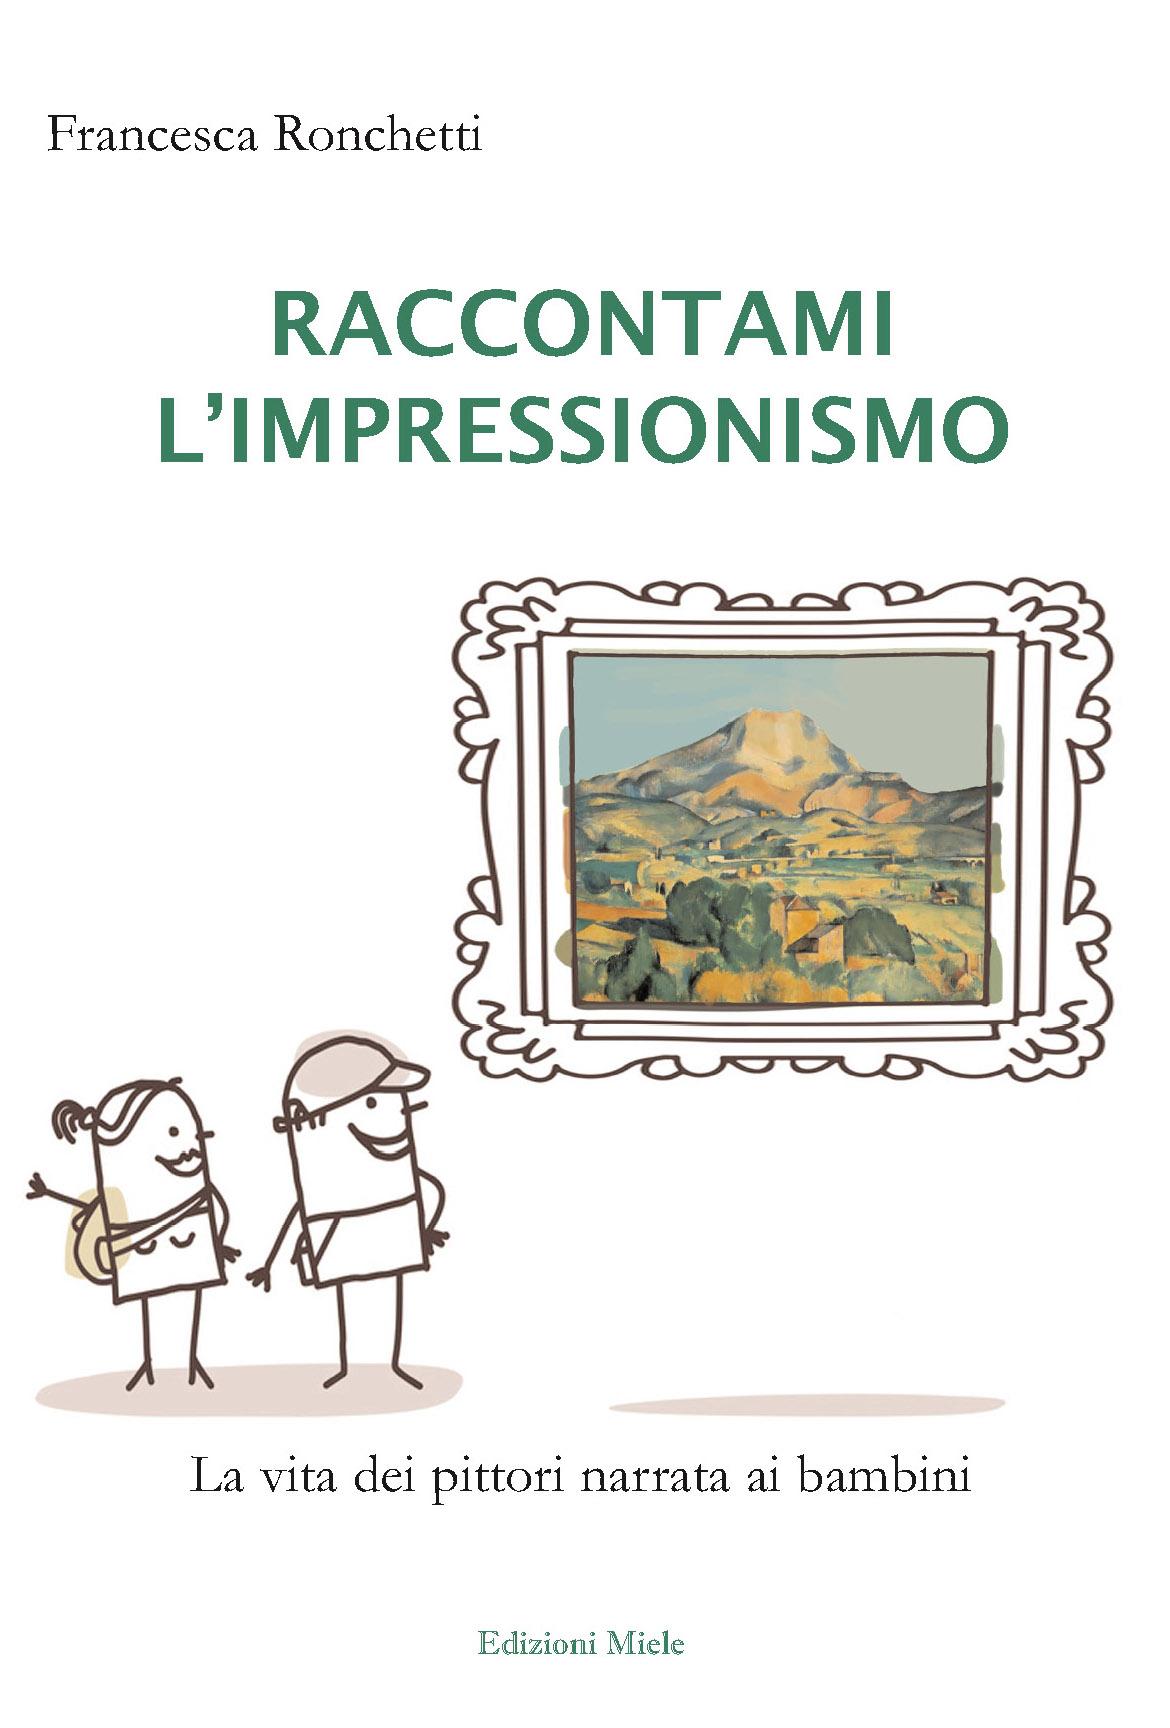 Raccontami l'impressionismo